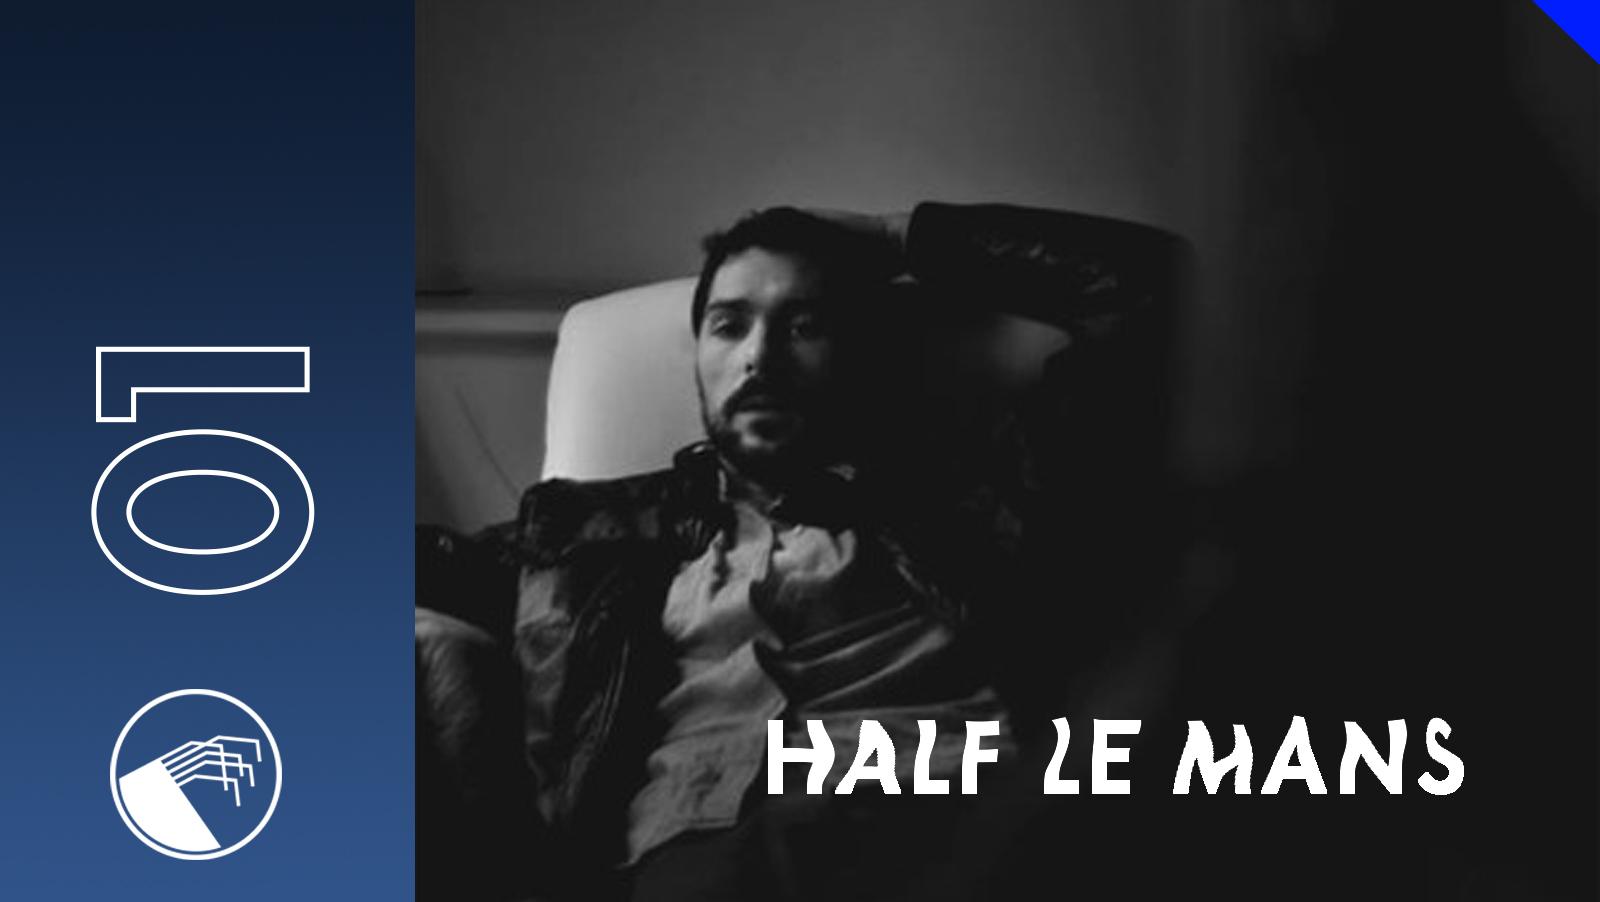 001 Half Le Mans